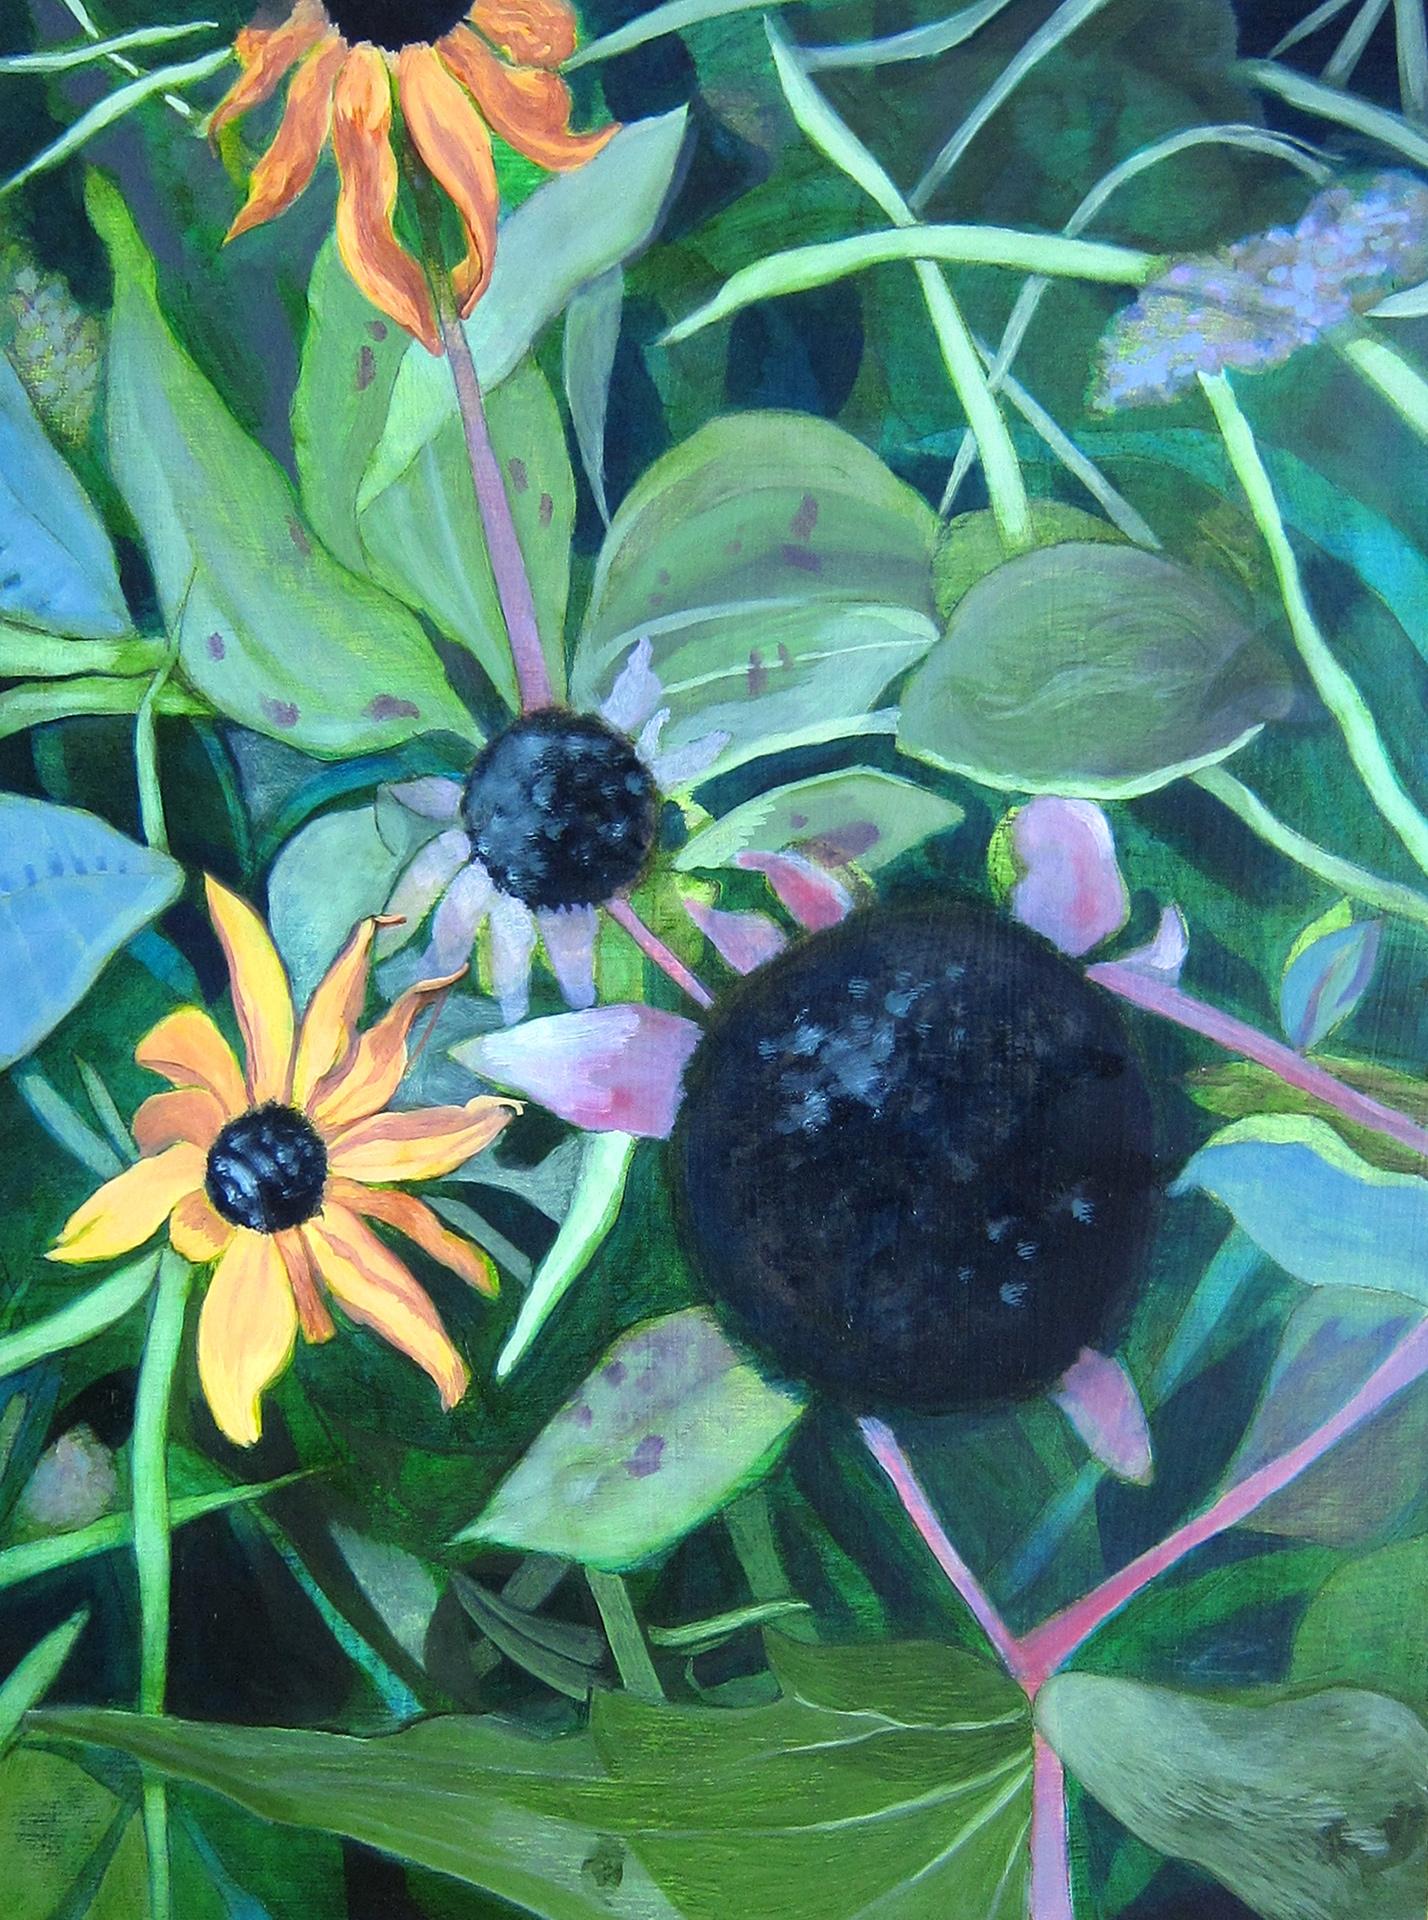 #4 Black-eyed Susans